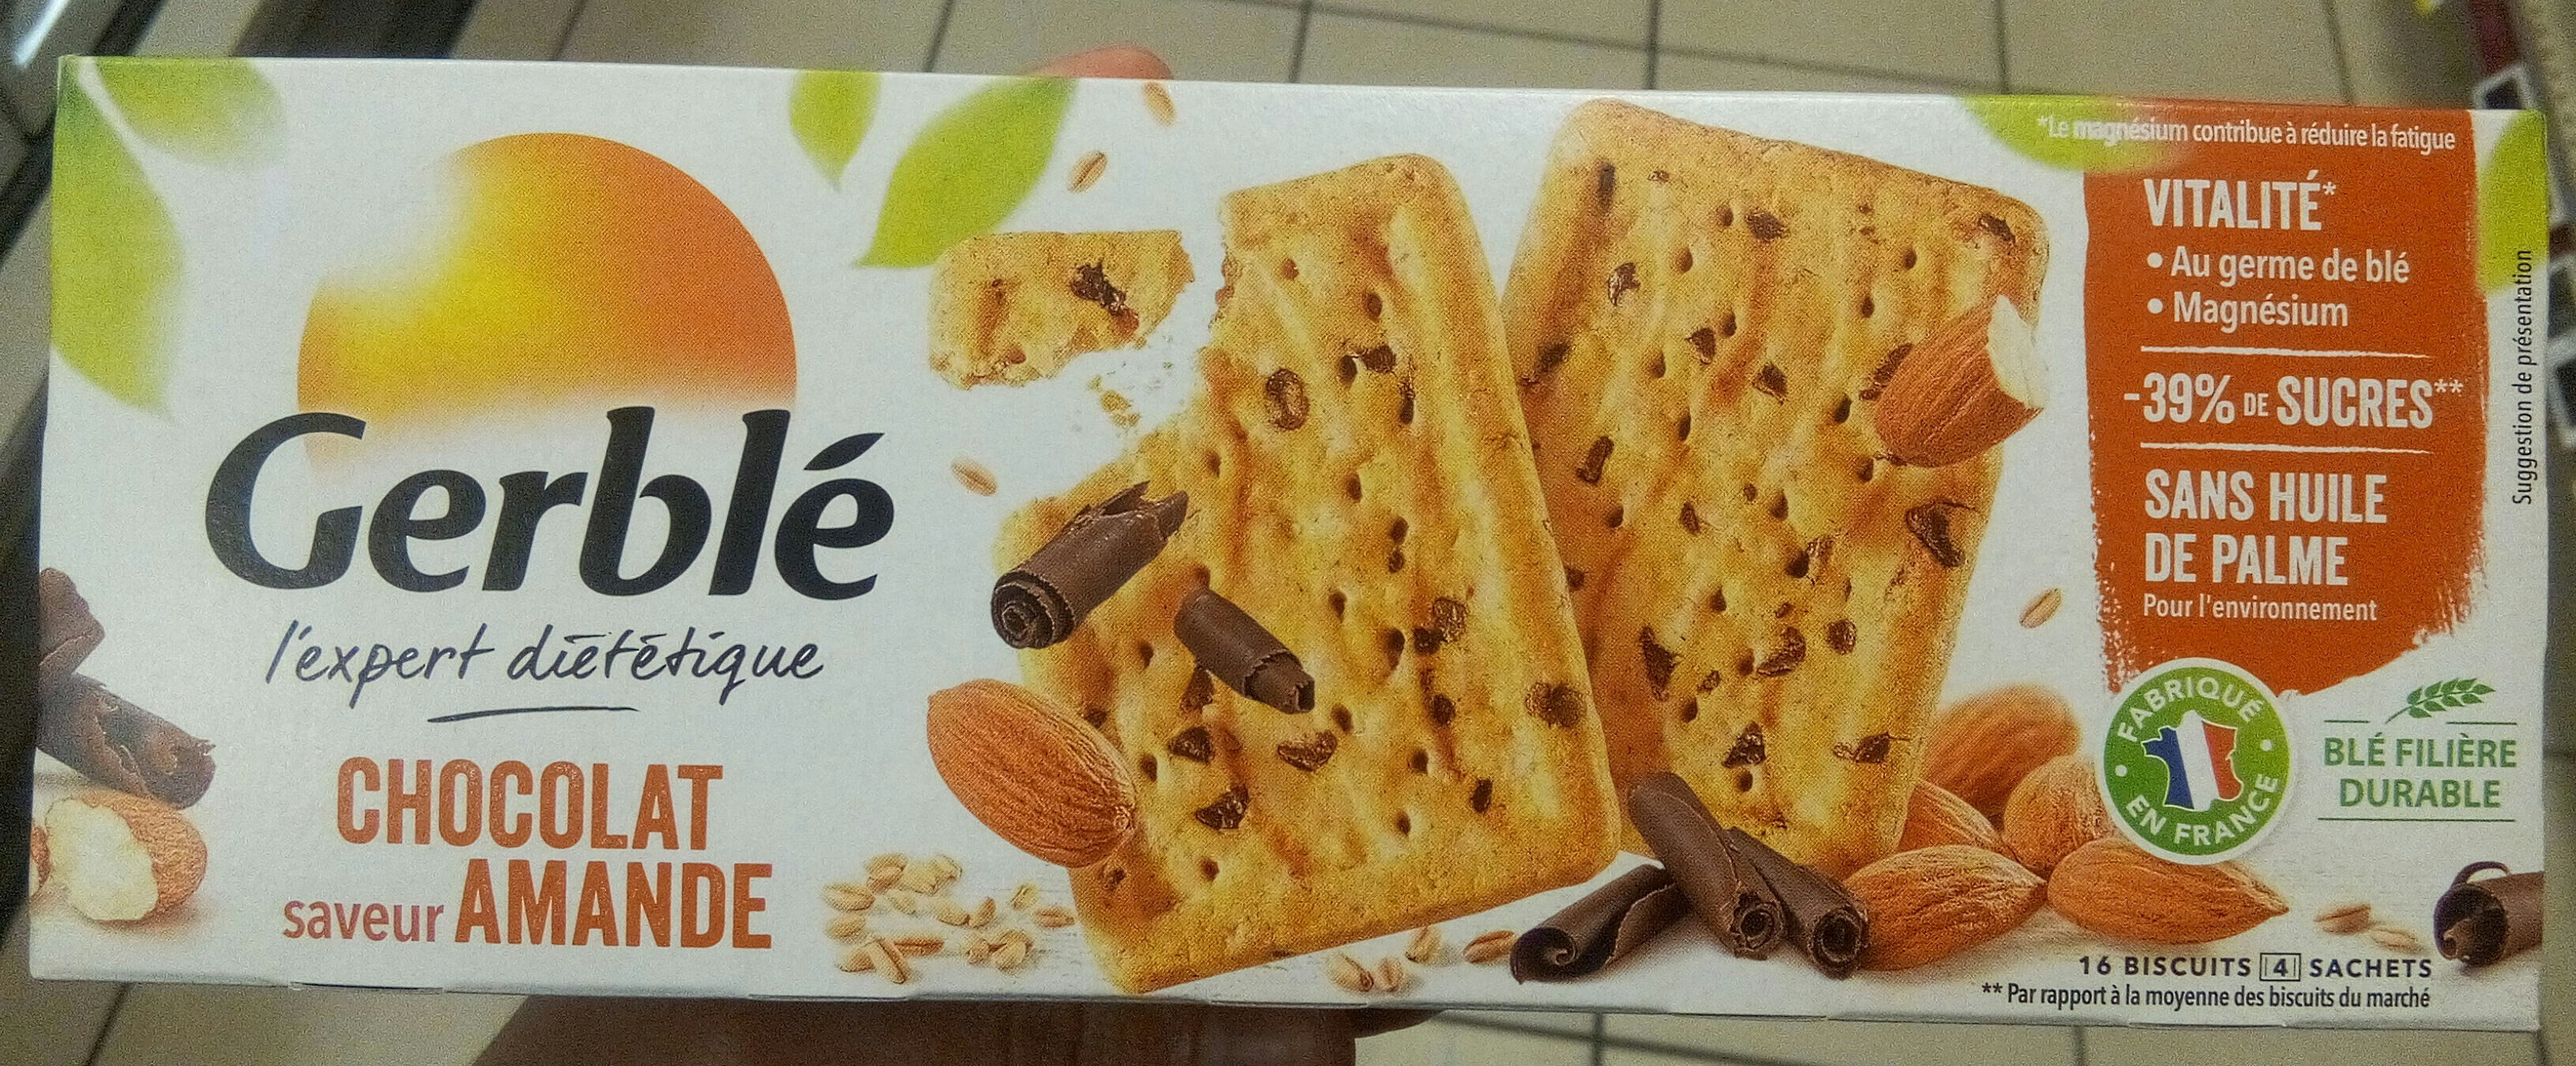 Biscuit chocolat saveur amande - Product - fr